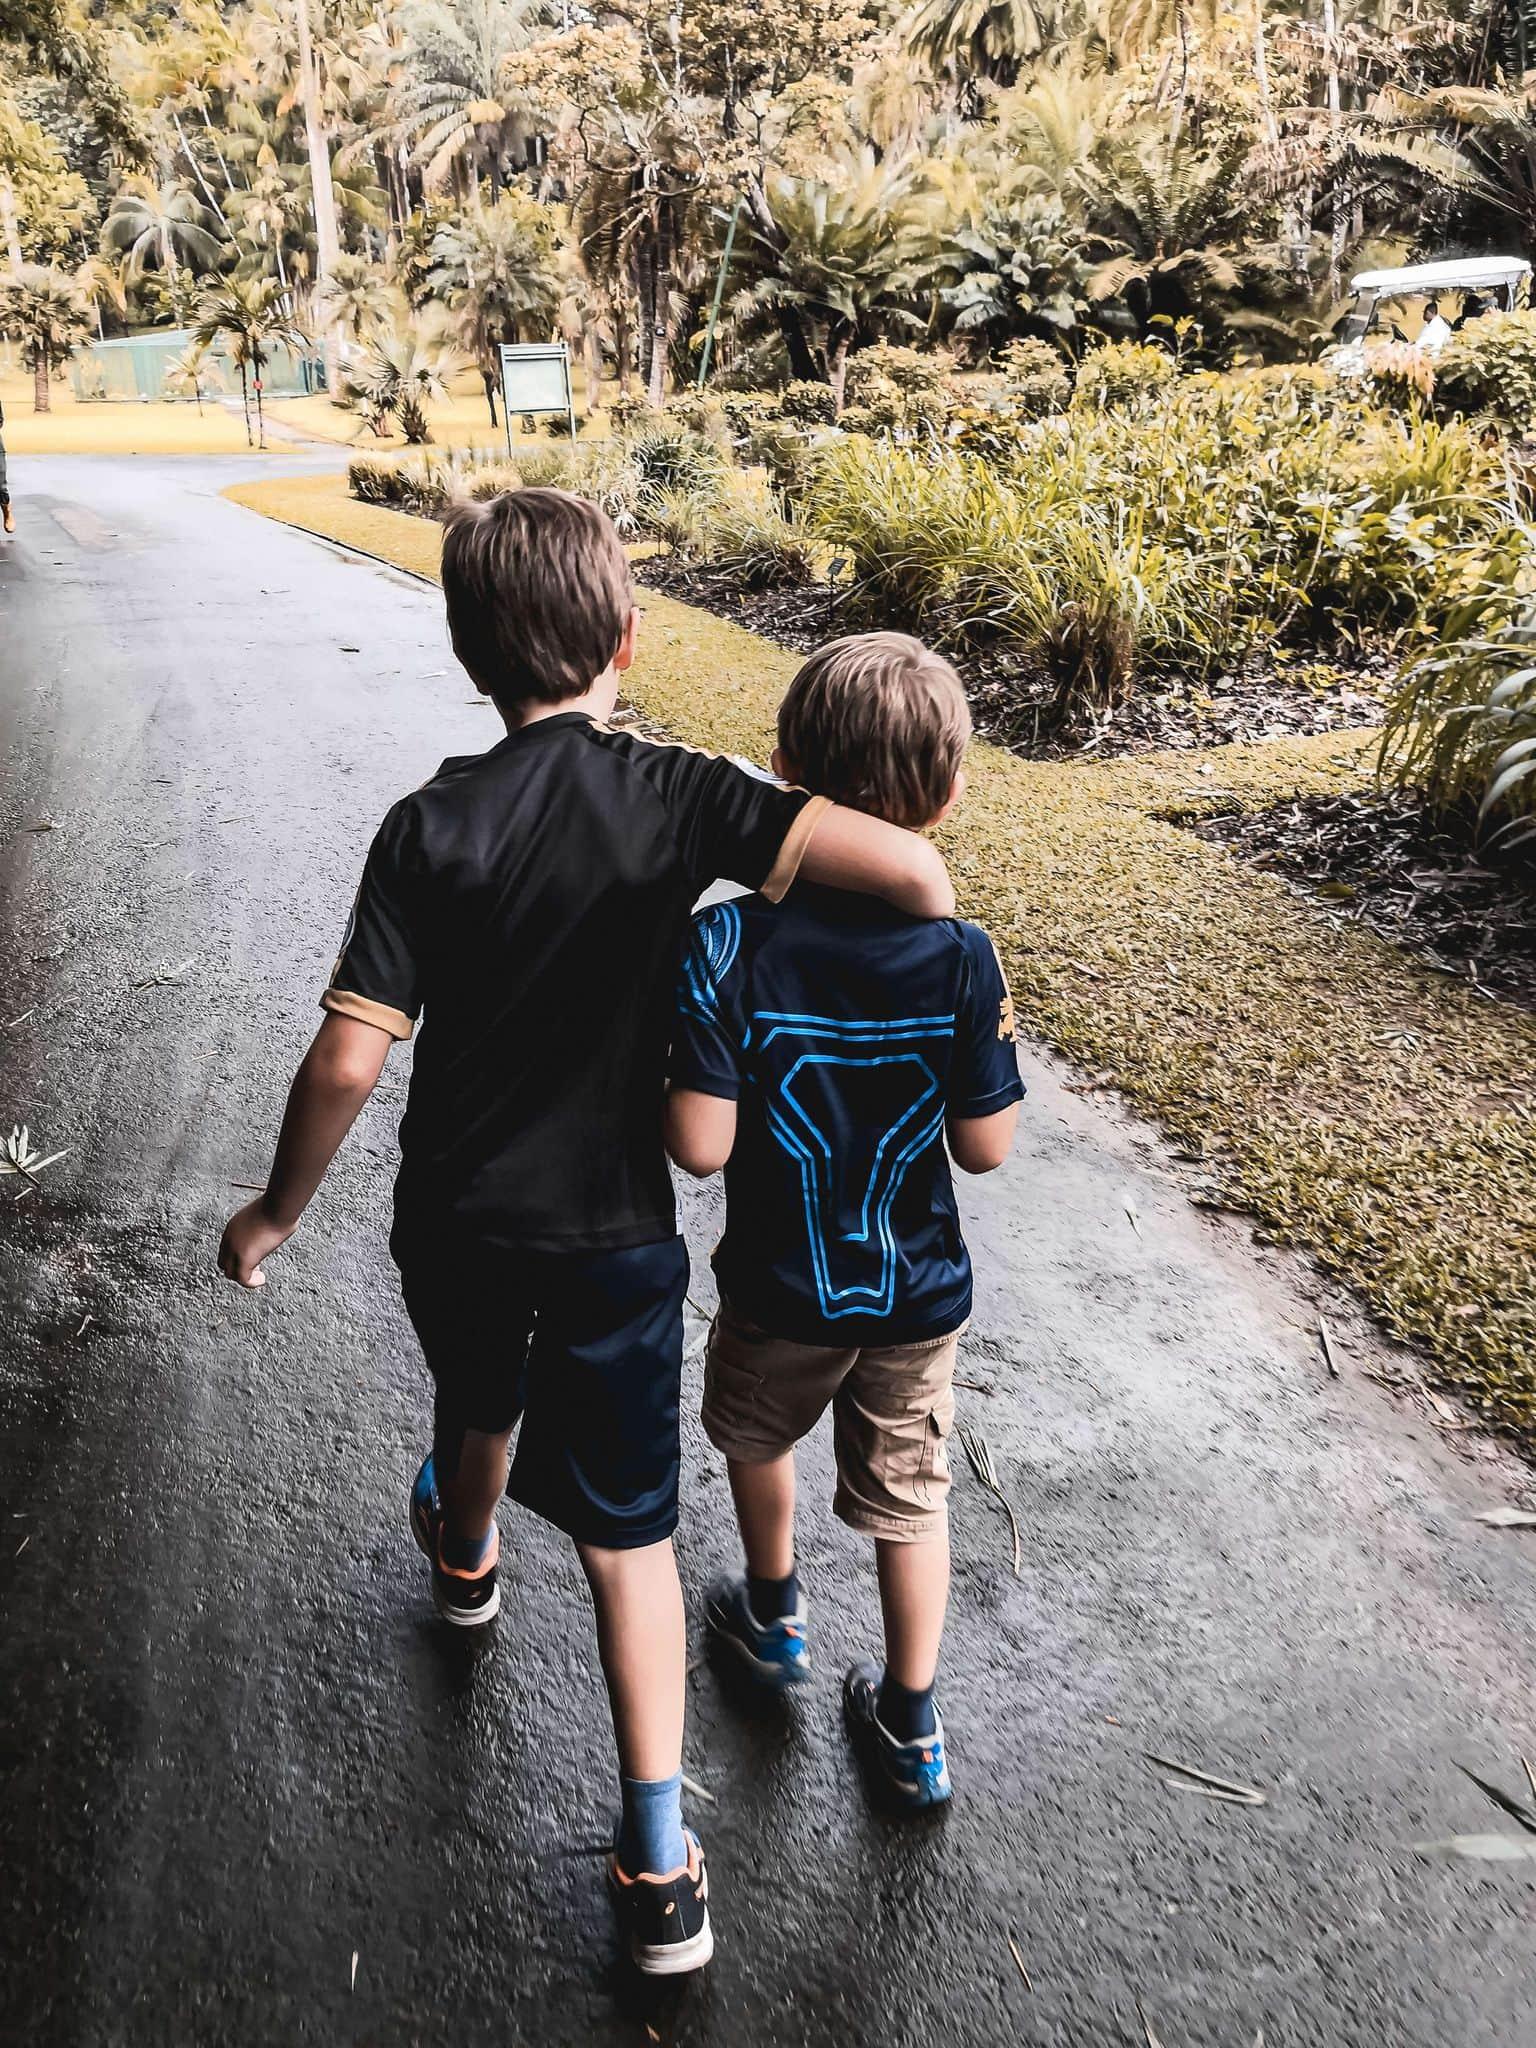 Children having fun hiking in Asia